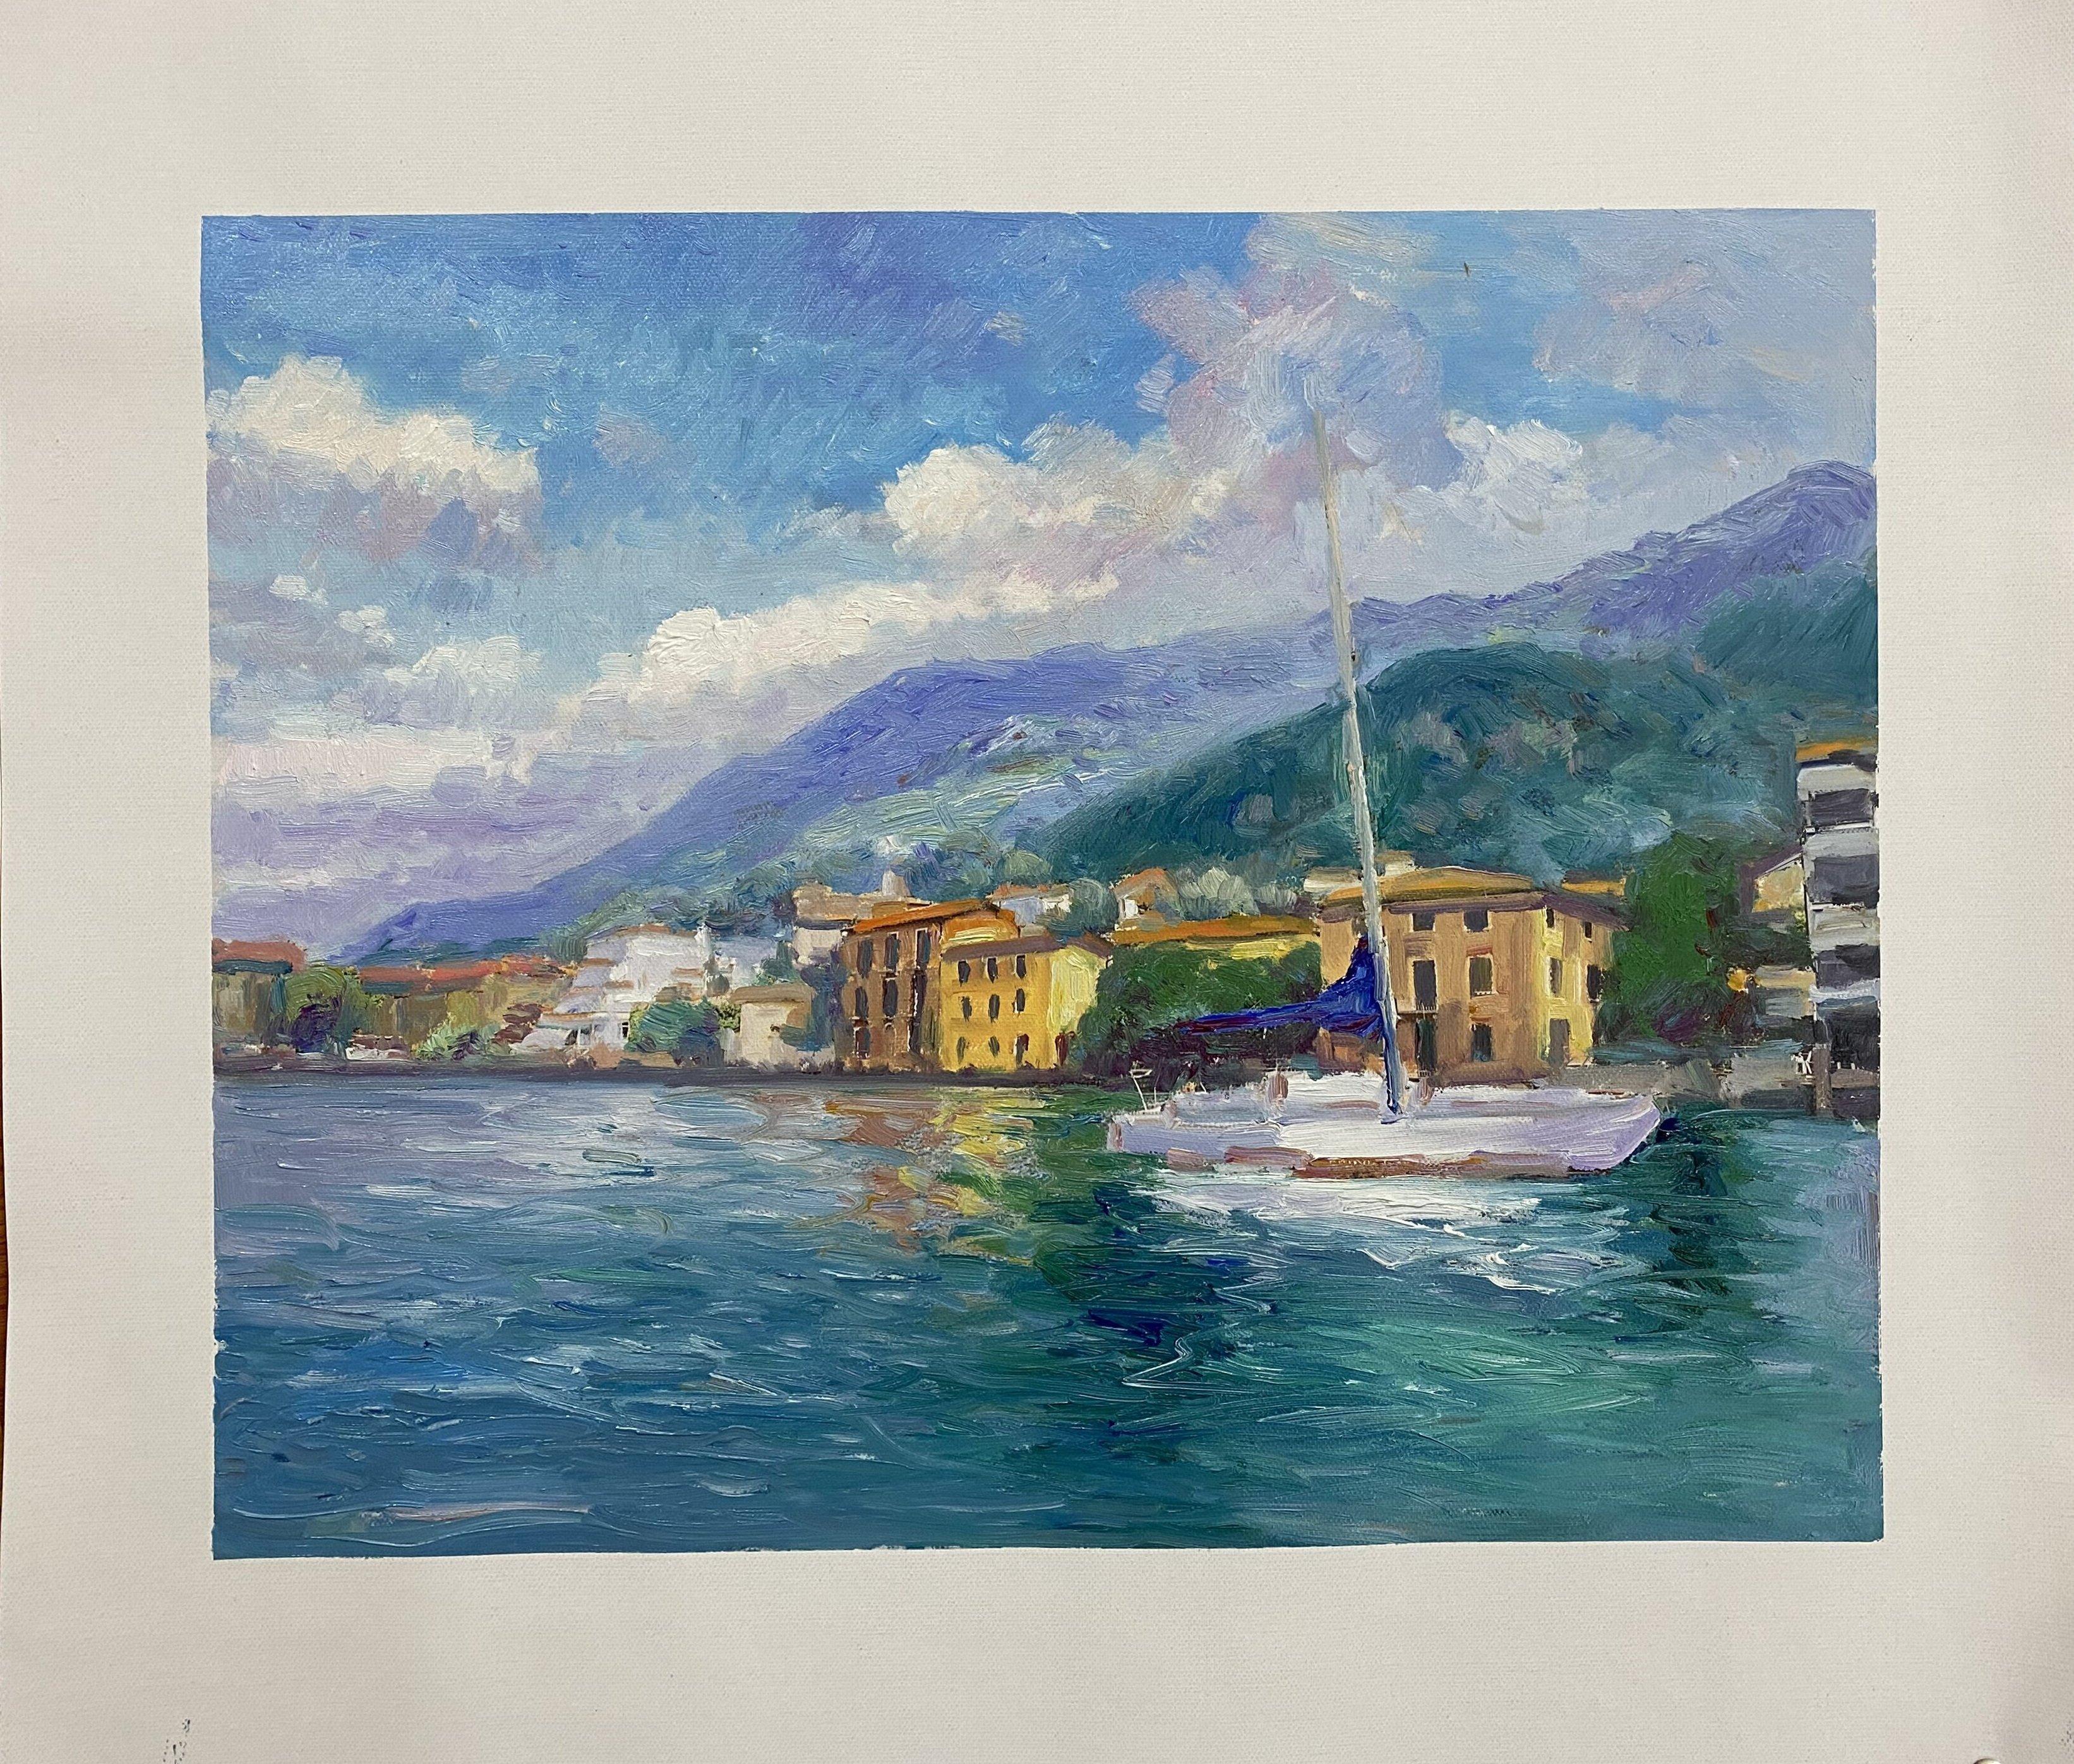 1339-painting-paintru-custom-artwork-lake-garda-travelgram